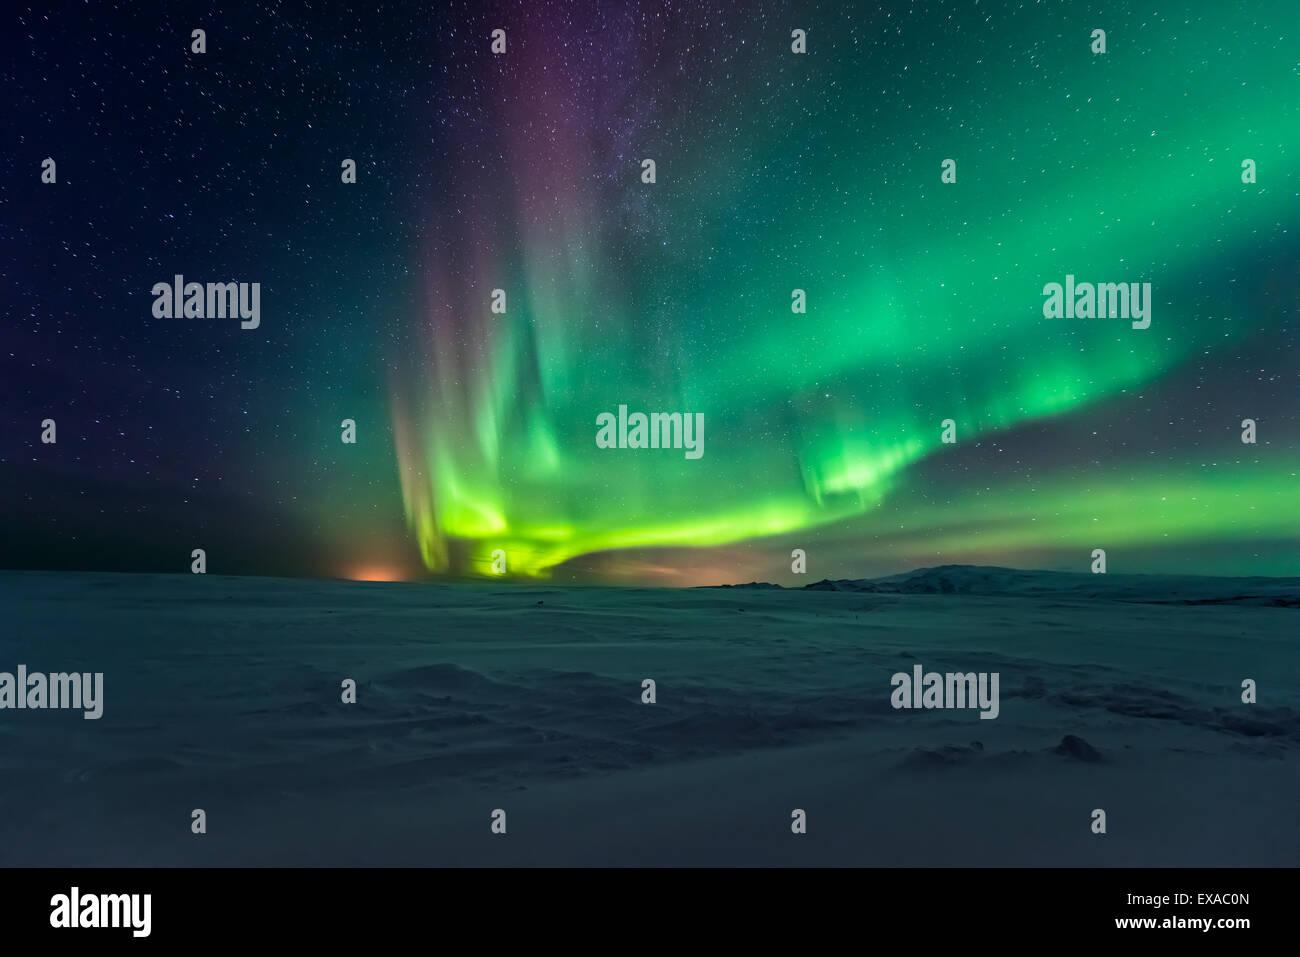 Aurora borealis, northern lights - Stock Image